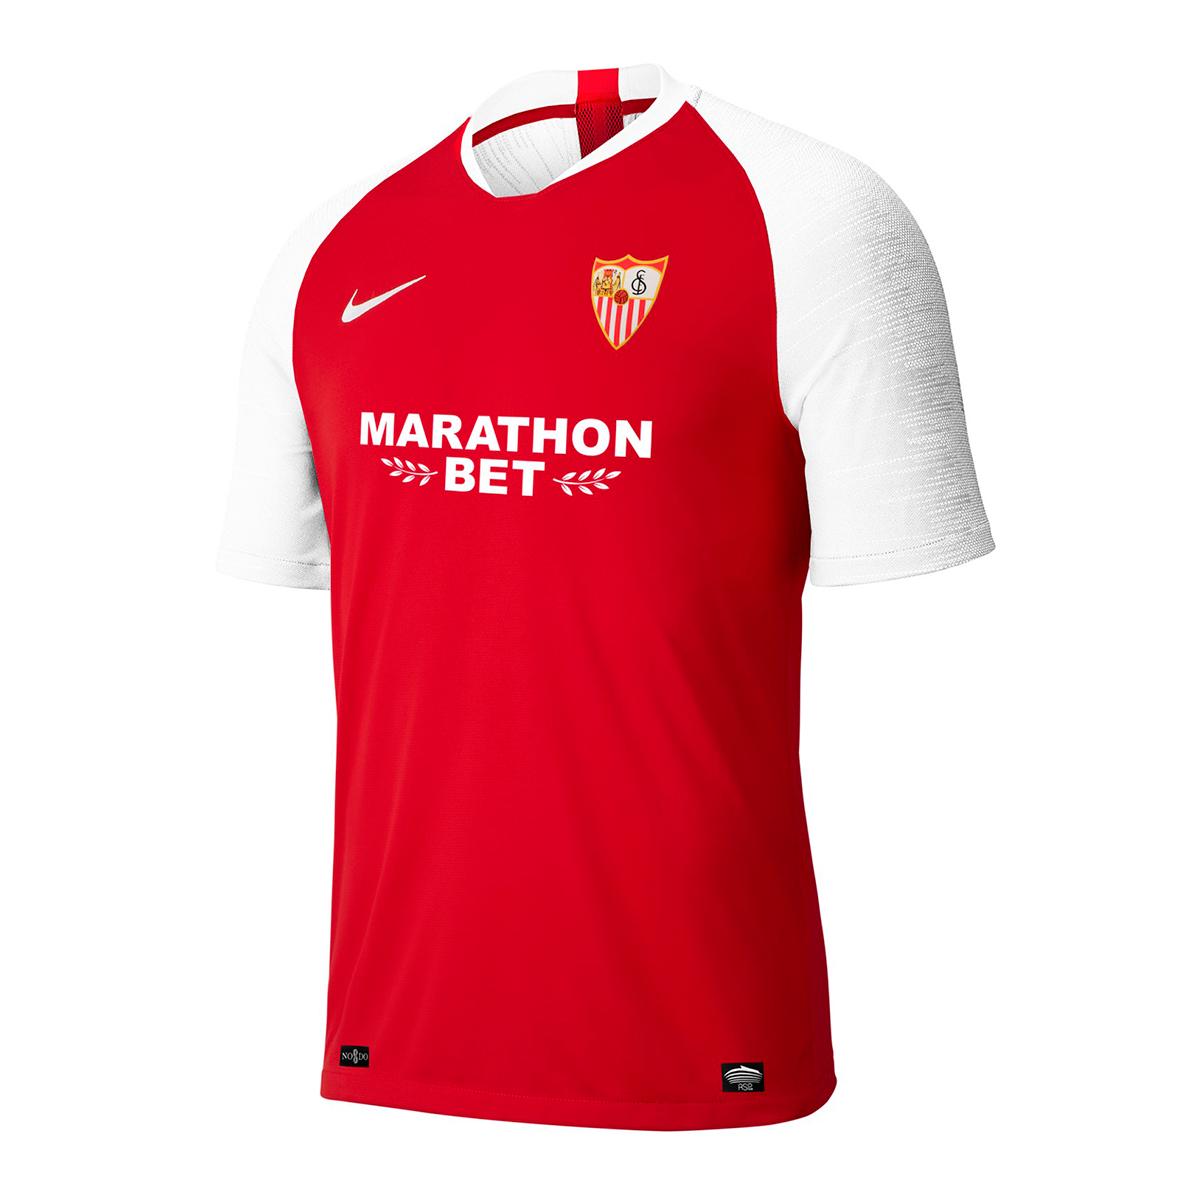 Maillot manches longues rouge Tiempo Premier Nike Ô Sports